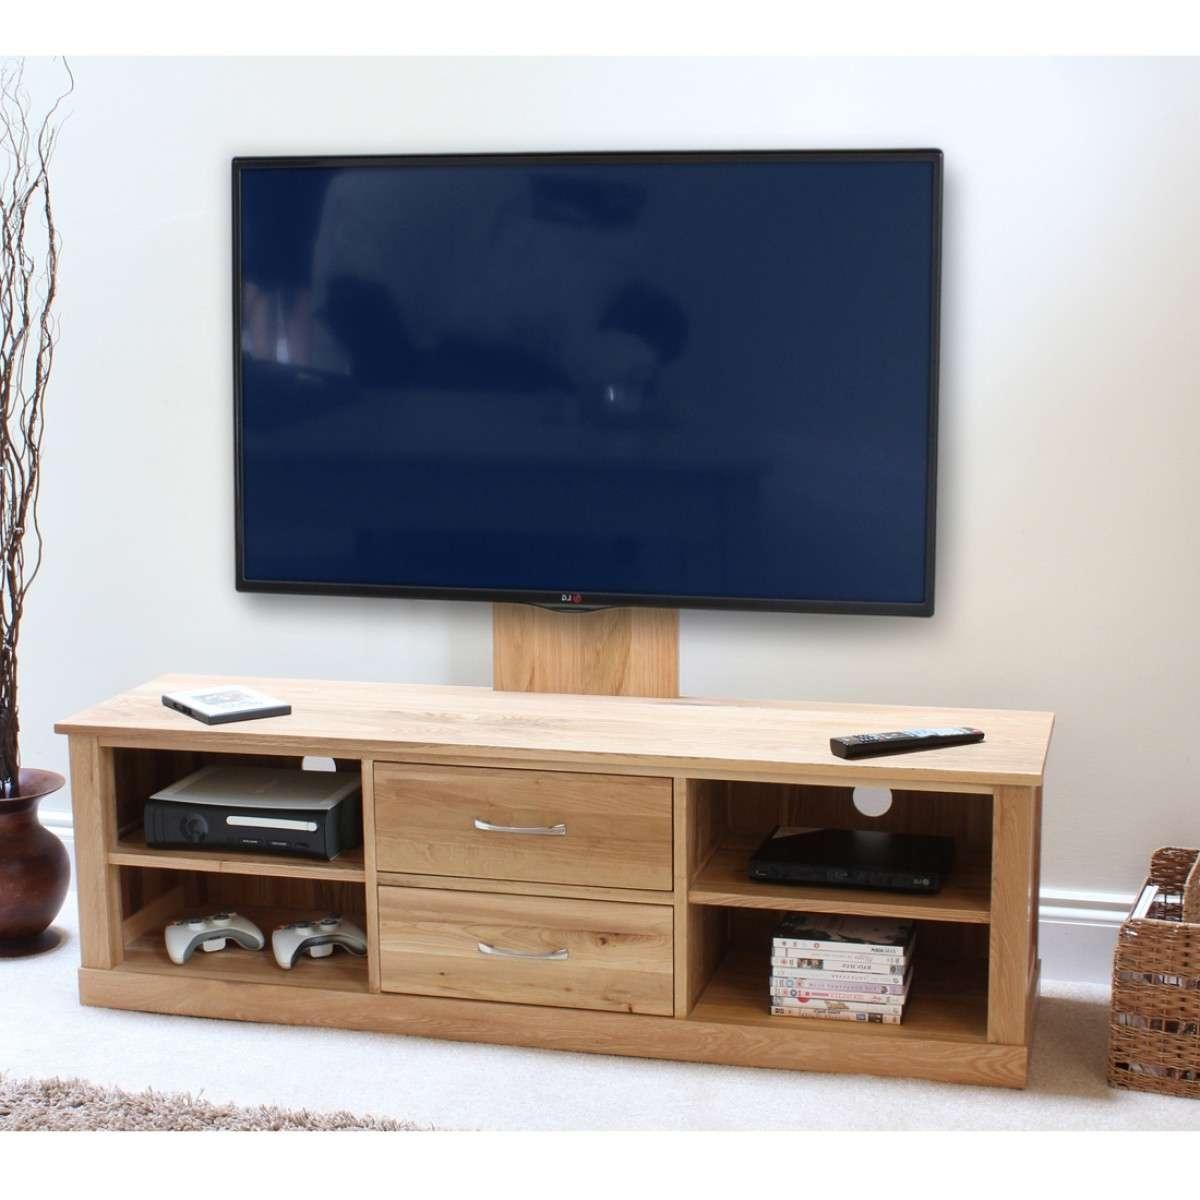 Baumhaus Mobel Oak Mounted Widescreen Tv Cabinet Cor09E For Widescreen Tv Cabinets (View 2 of 20)